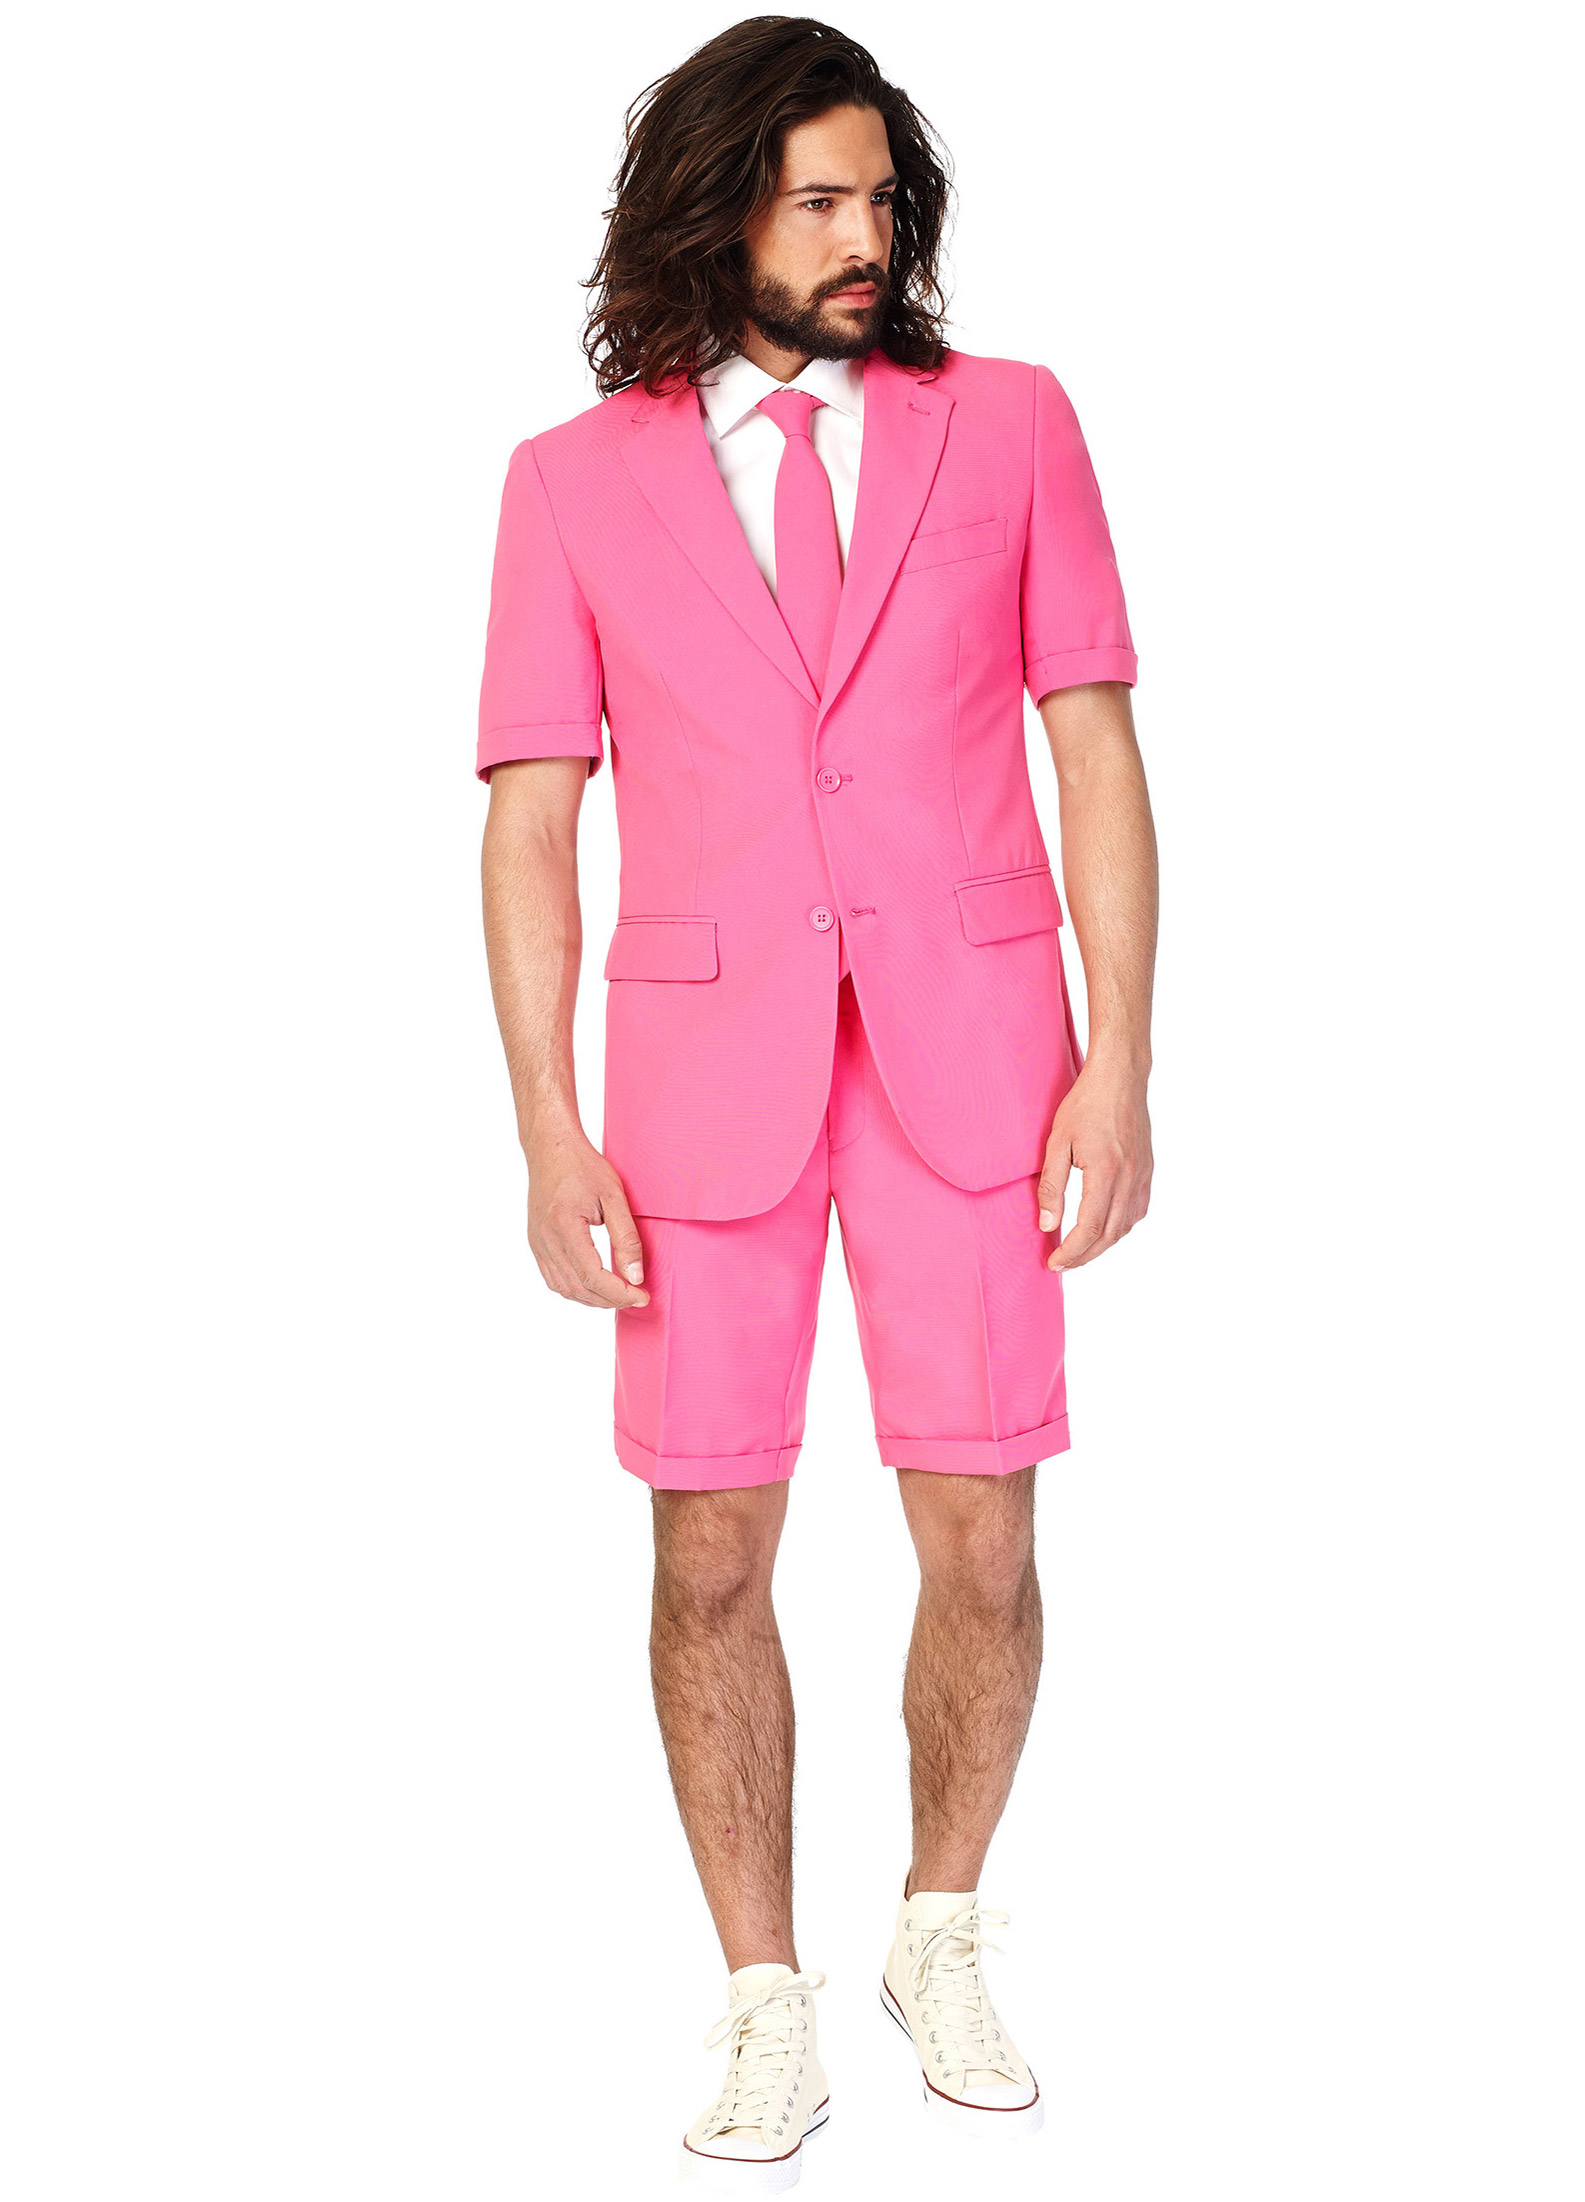 mr pink anzug opposuits f r herren. Black Bedroom Furniture Sets. Home Design Ideas